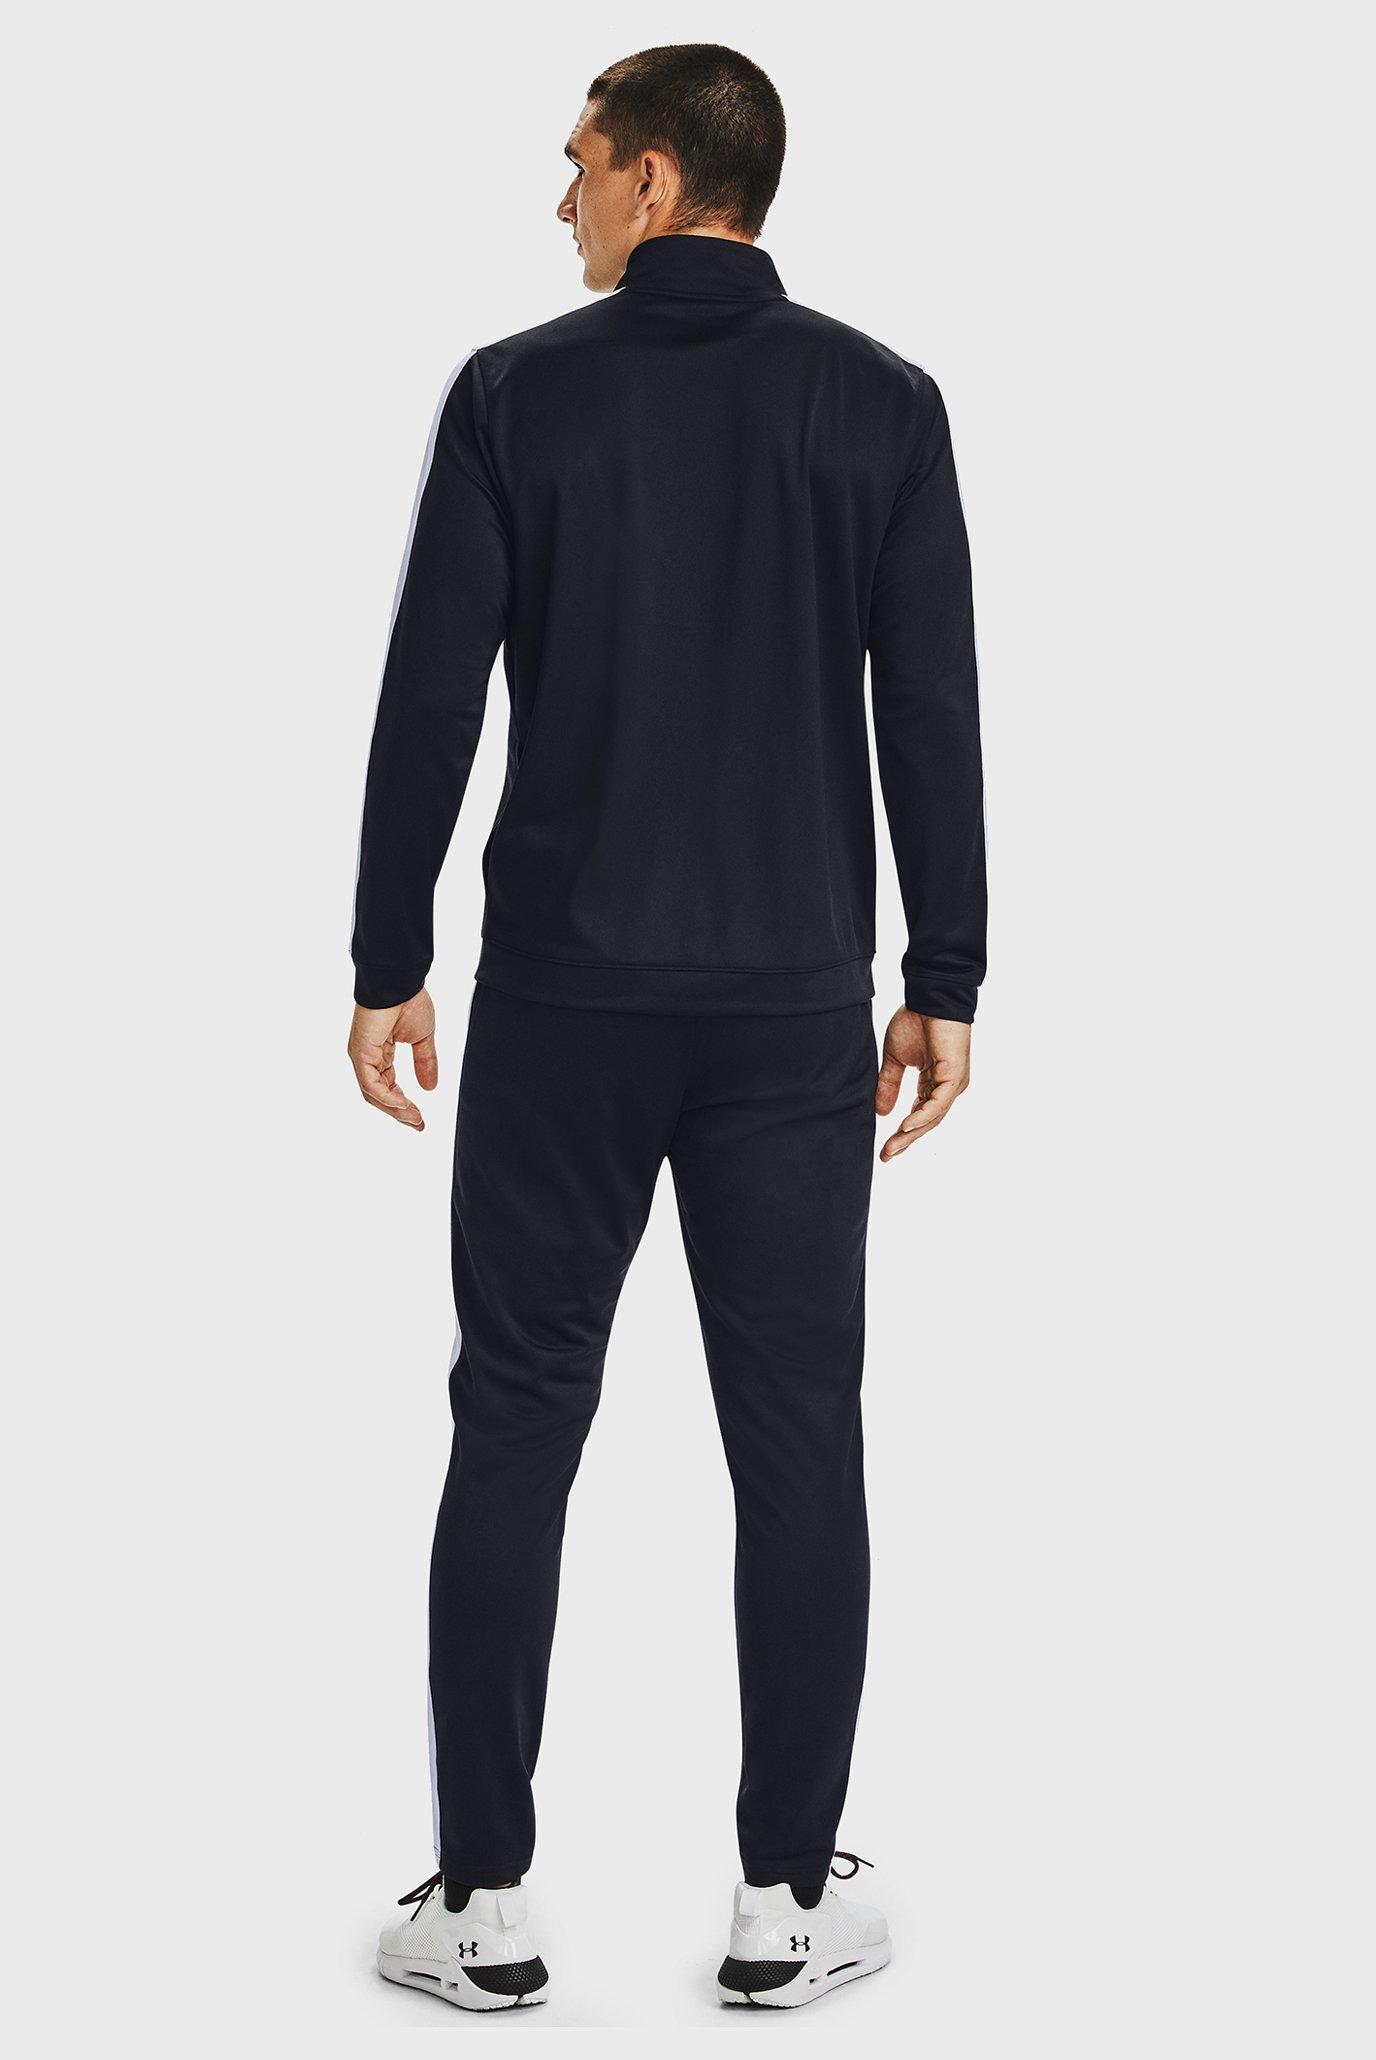 Чоловічий чорний спортивний костюм (кофта, штани) UA EMEA Track Under Armour